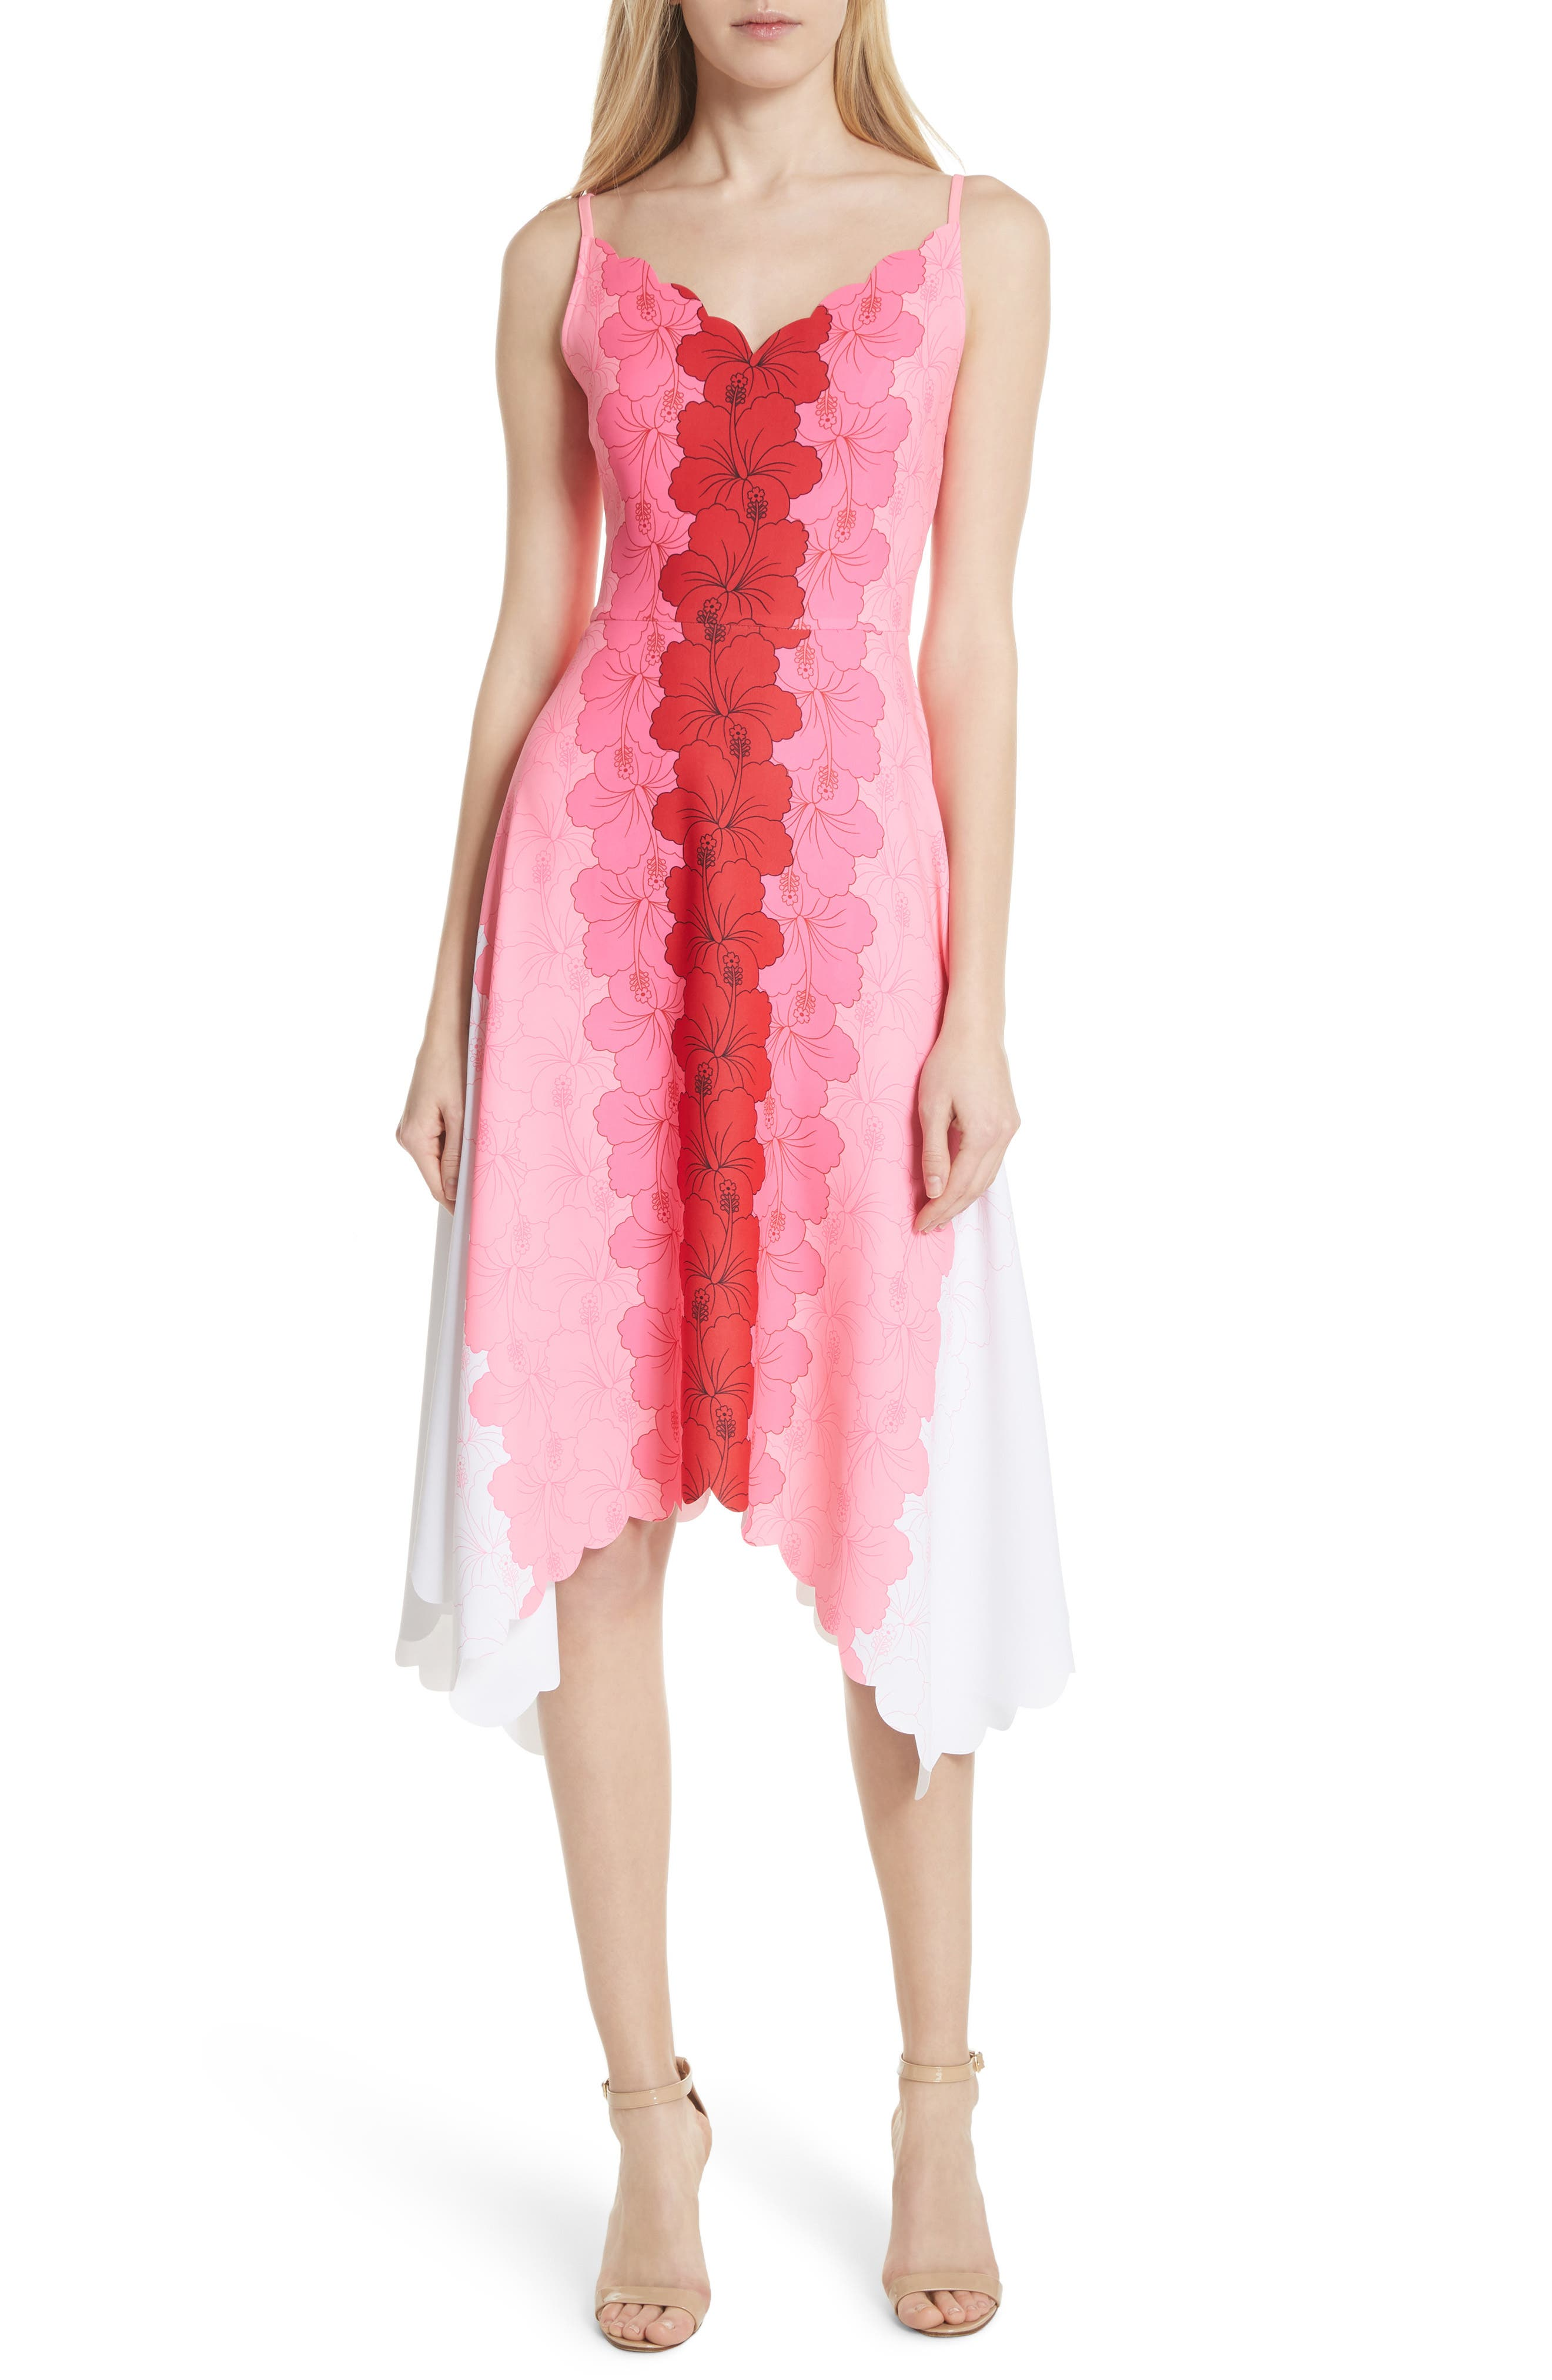 Ritsa Happiness Dress,                         Main,                         color, 671